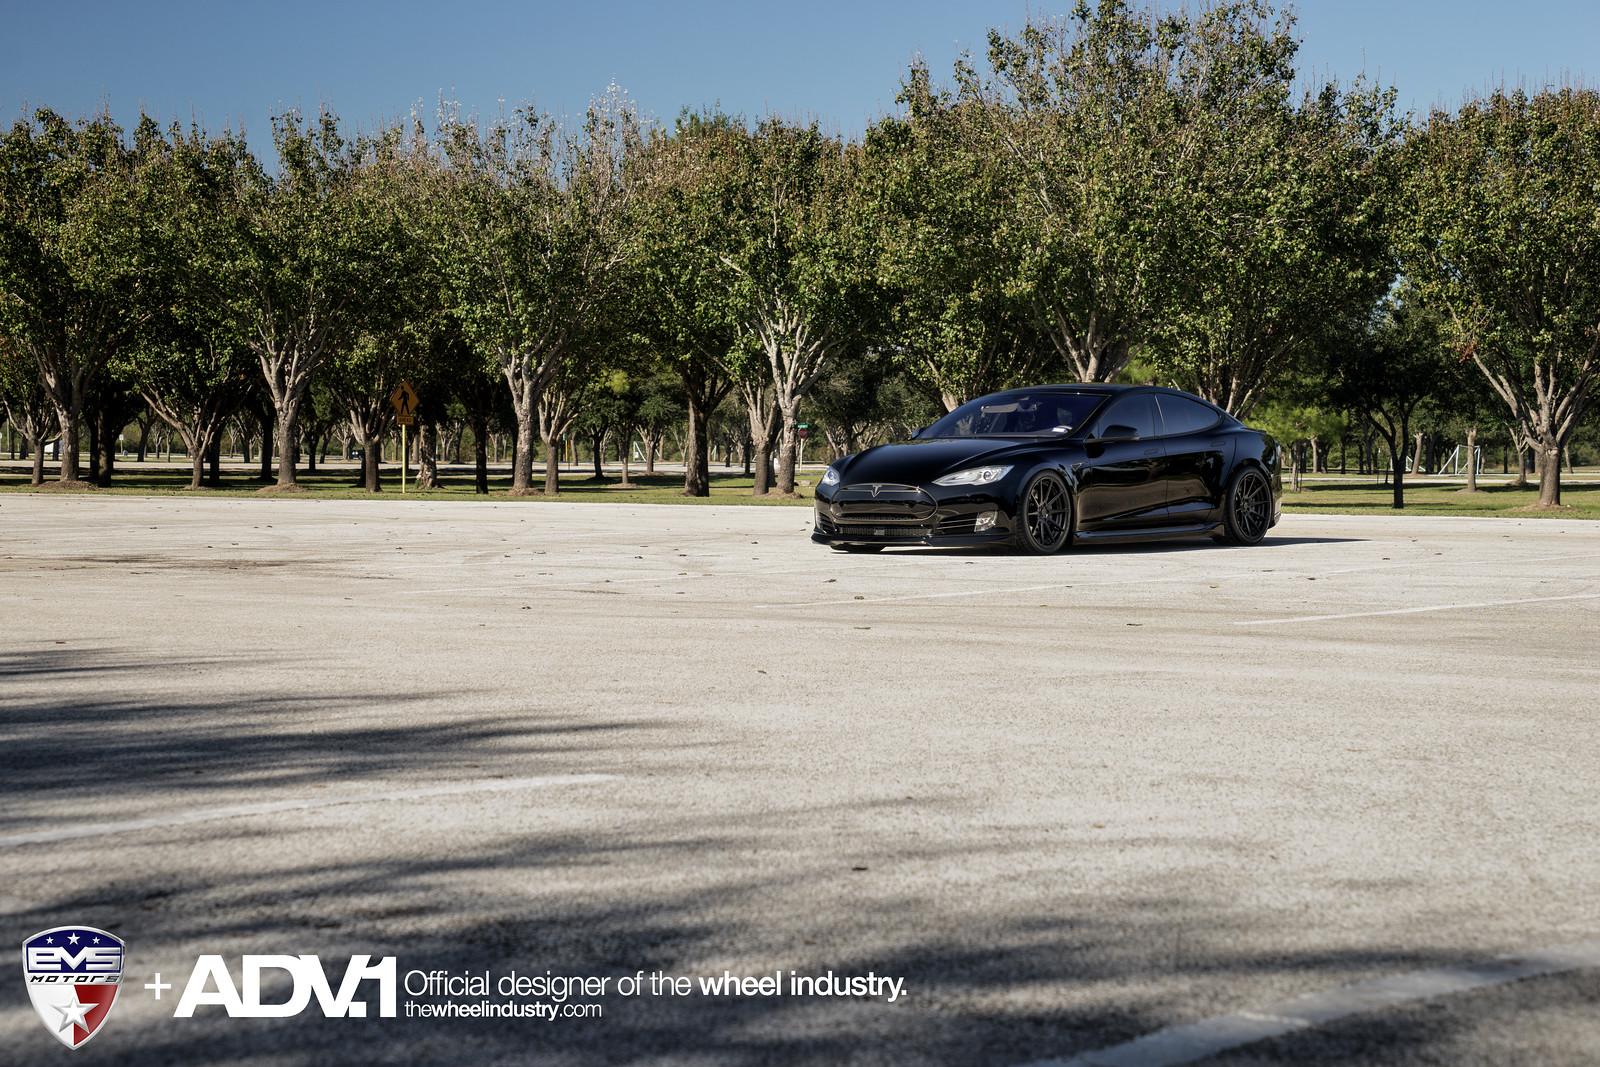 ADV1_EVS_Motors_Tesla_Model_S-5-X3.jpg